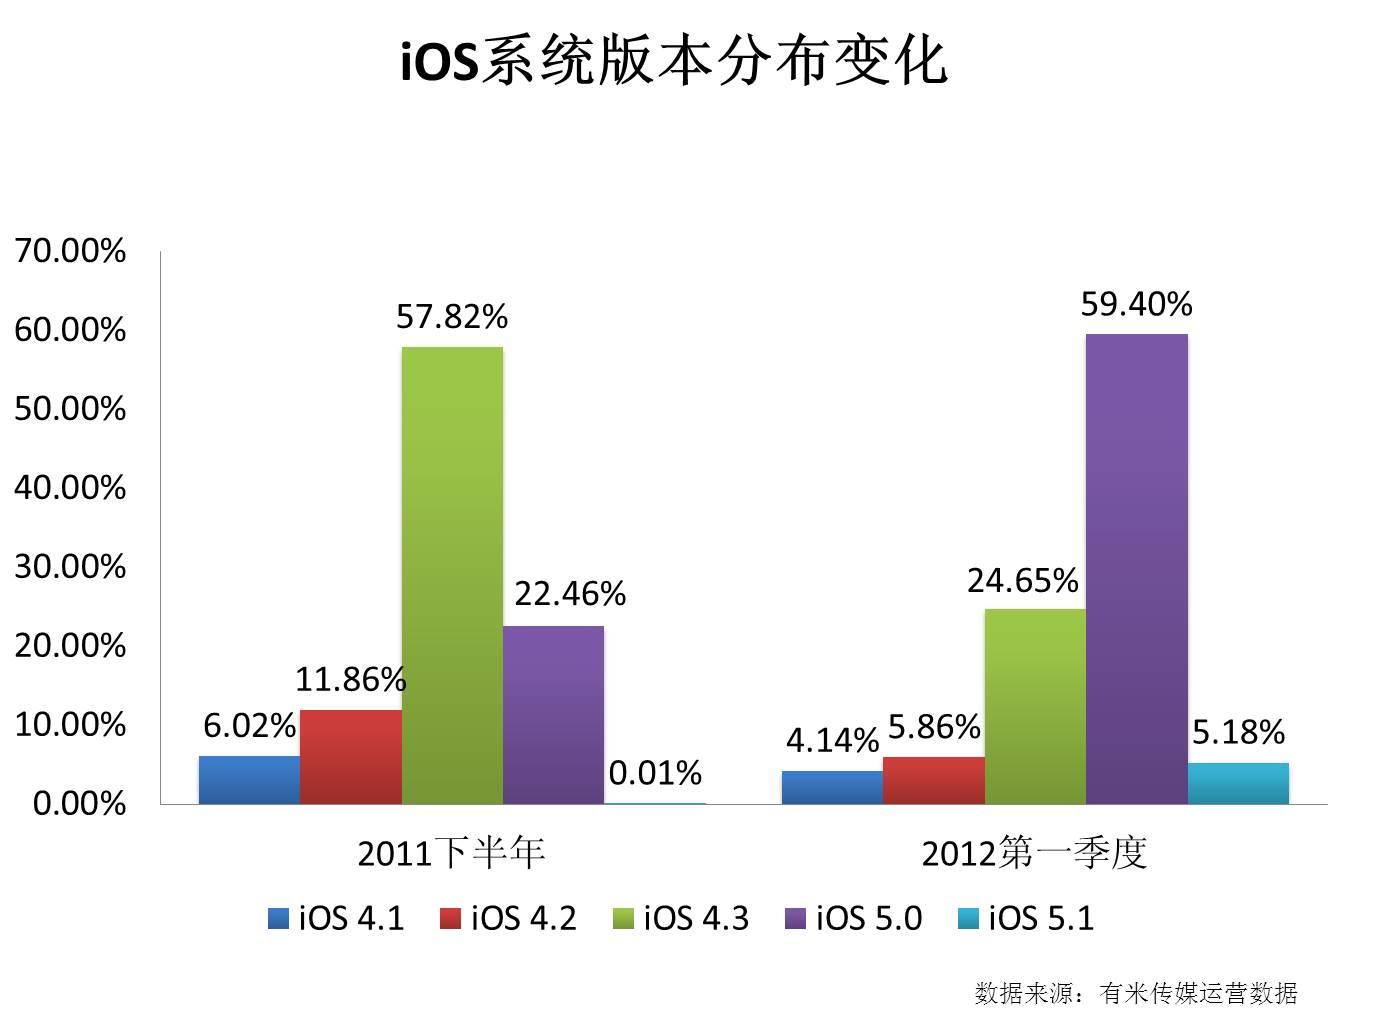 iOS系统版本分布变化